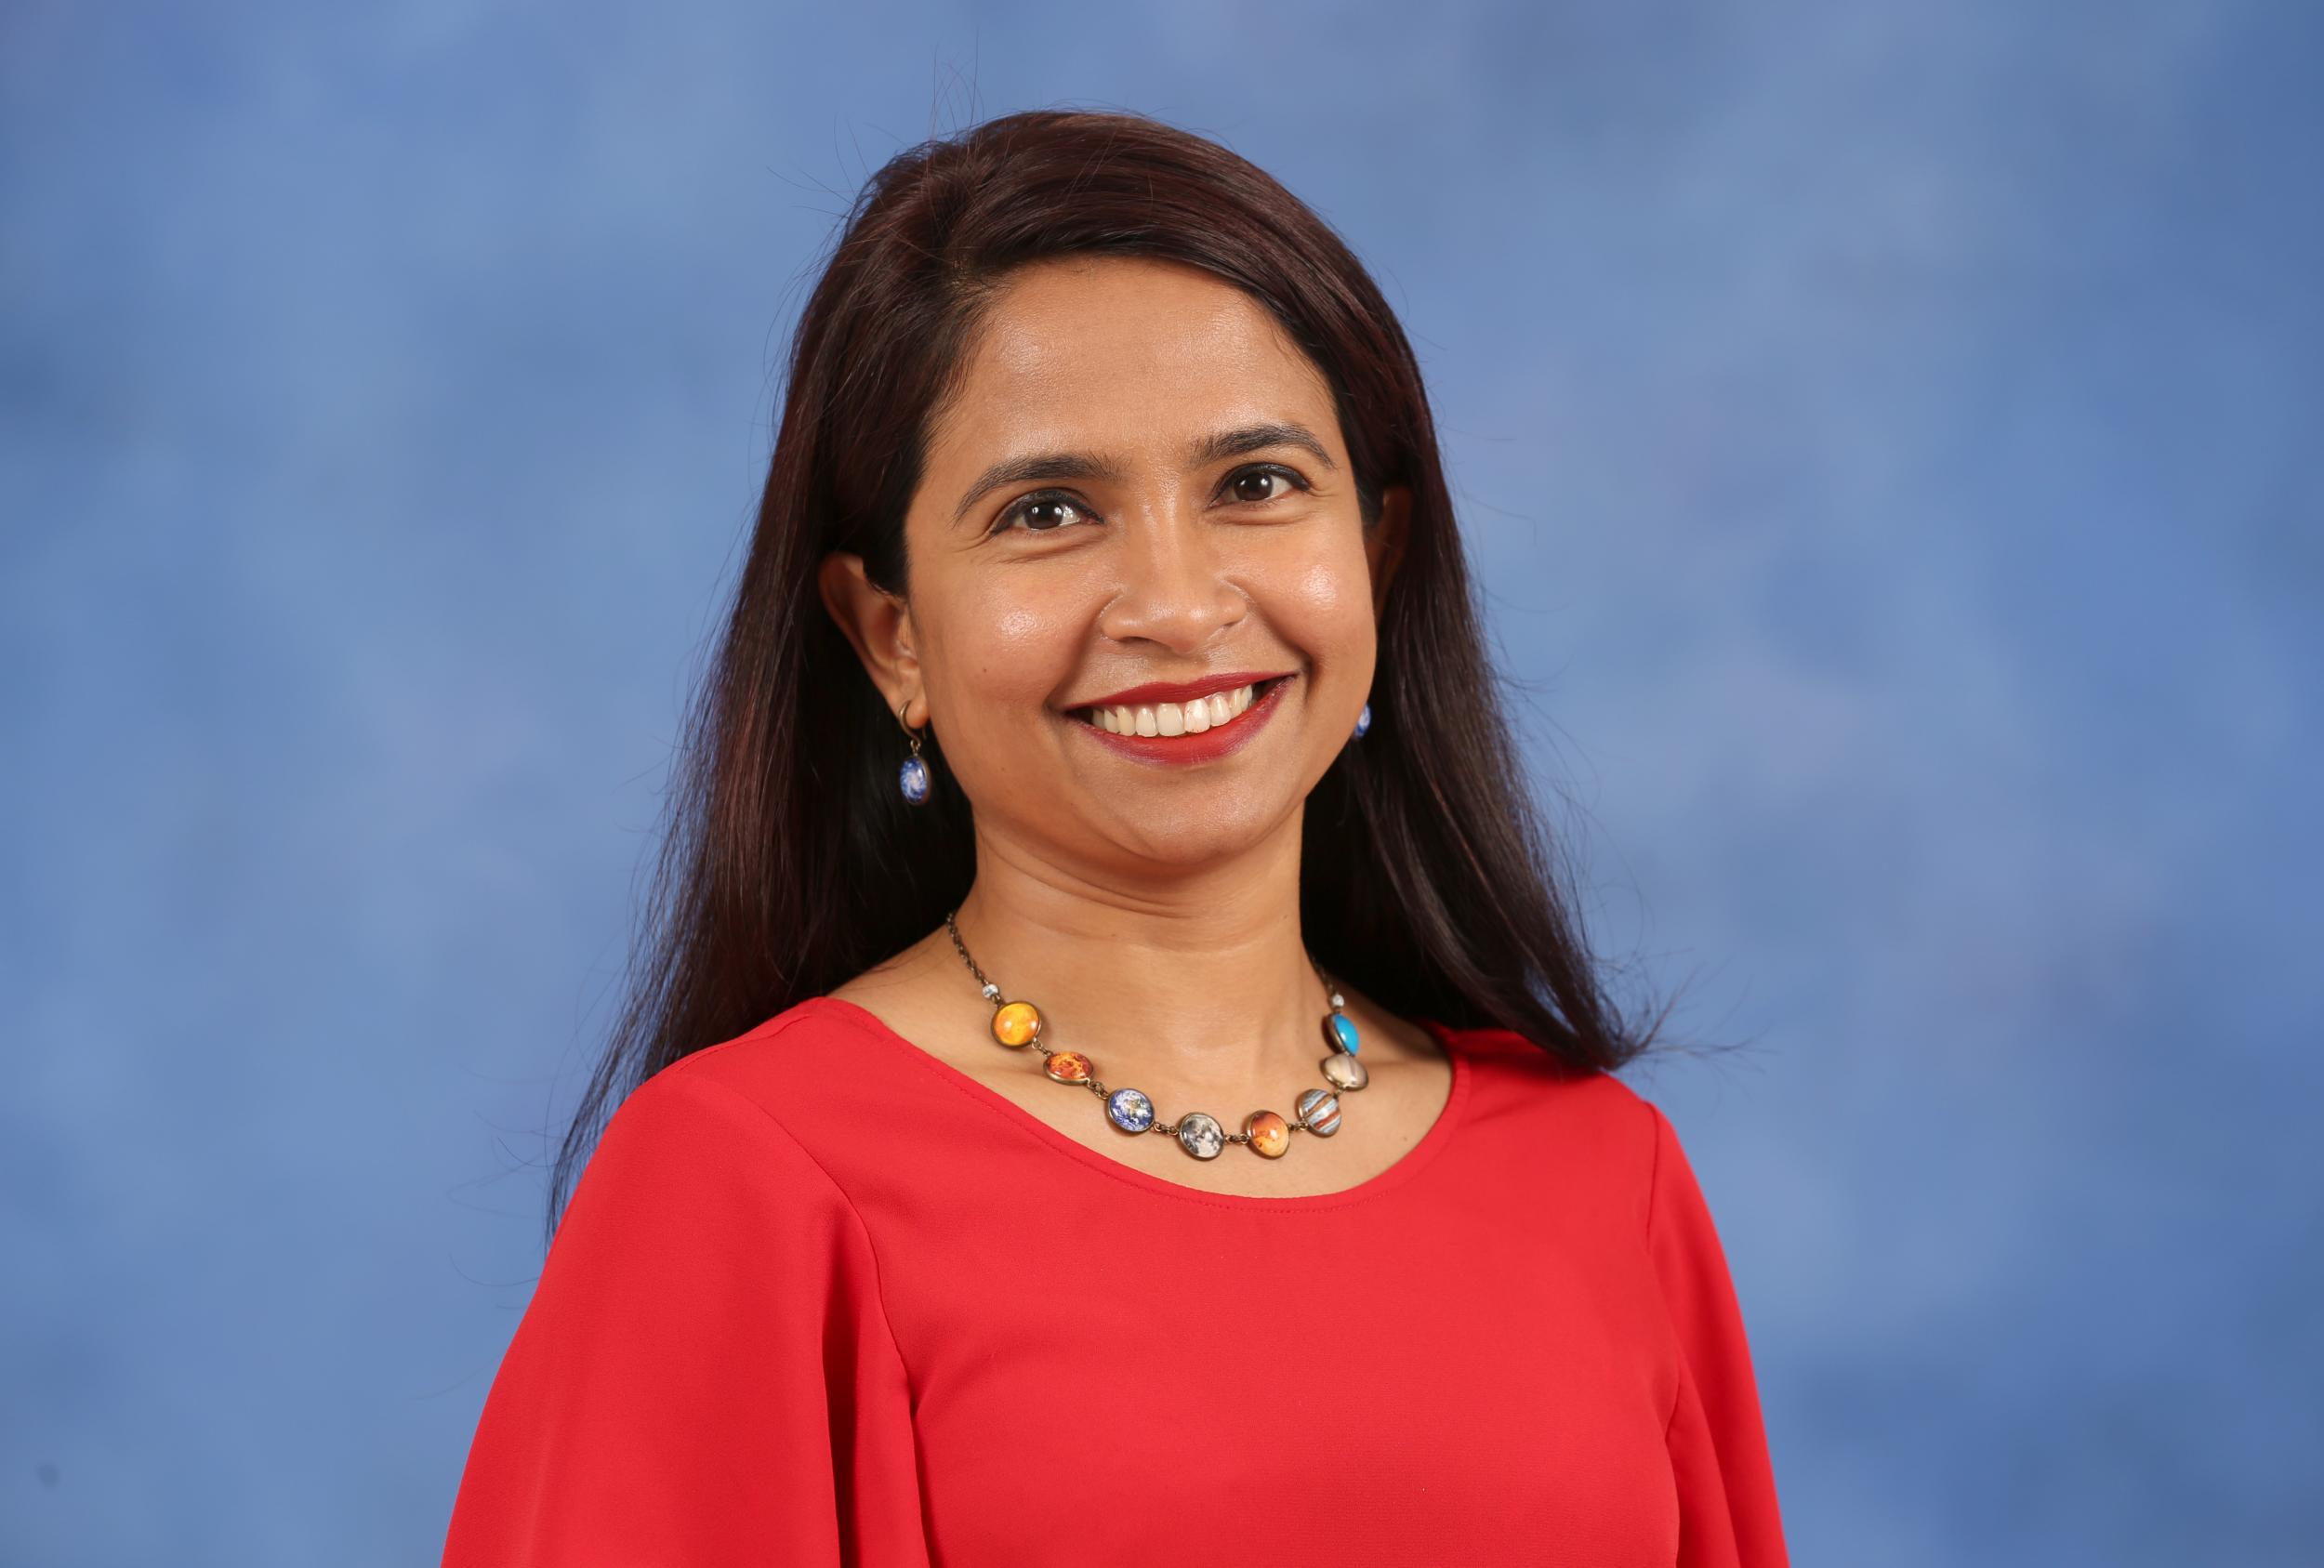 Dr. Samira Tasnim